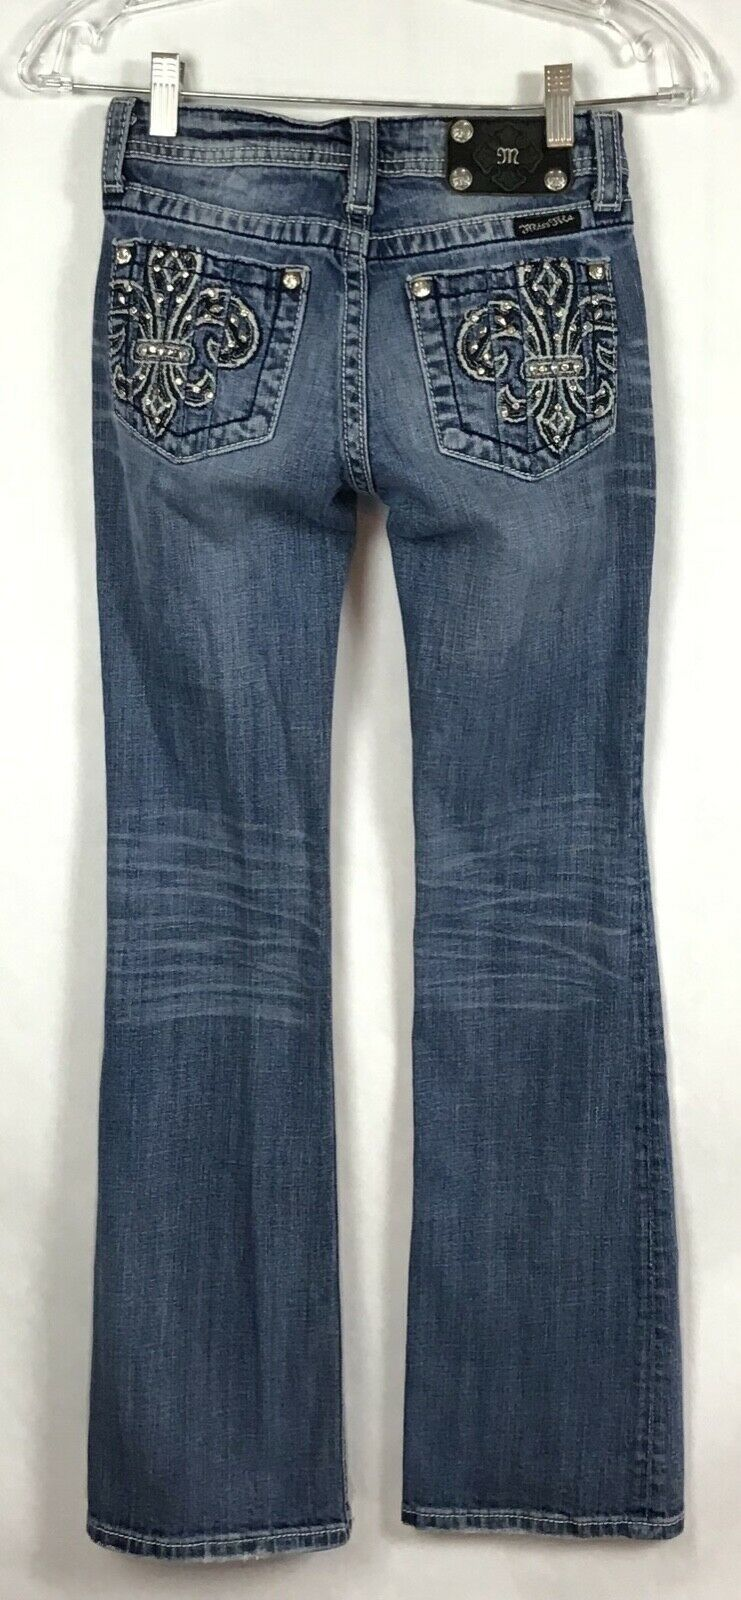 Miss Me Jeans Girls Size 14 Jeans Fleur De Lis BLING Bootcut Distressed B6-9 image 4